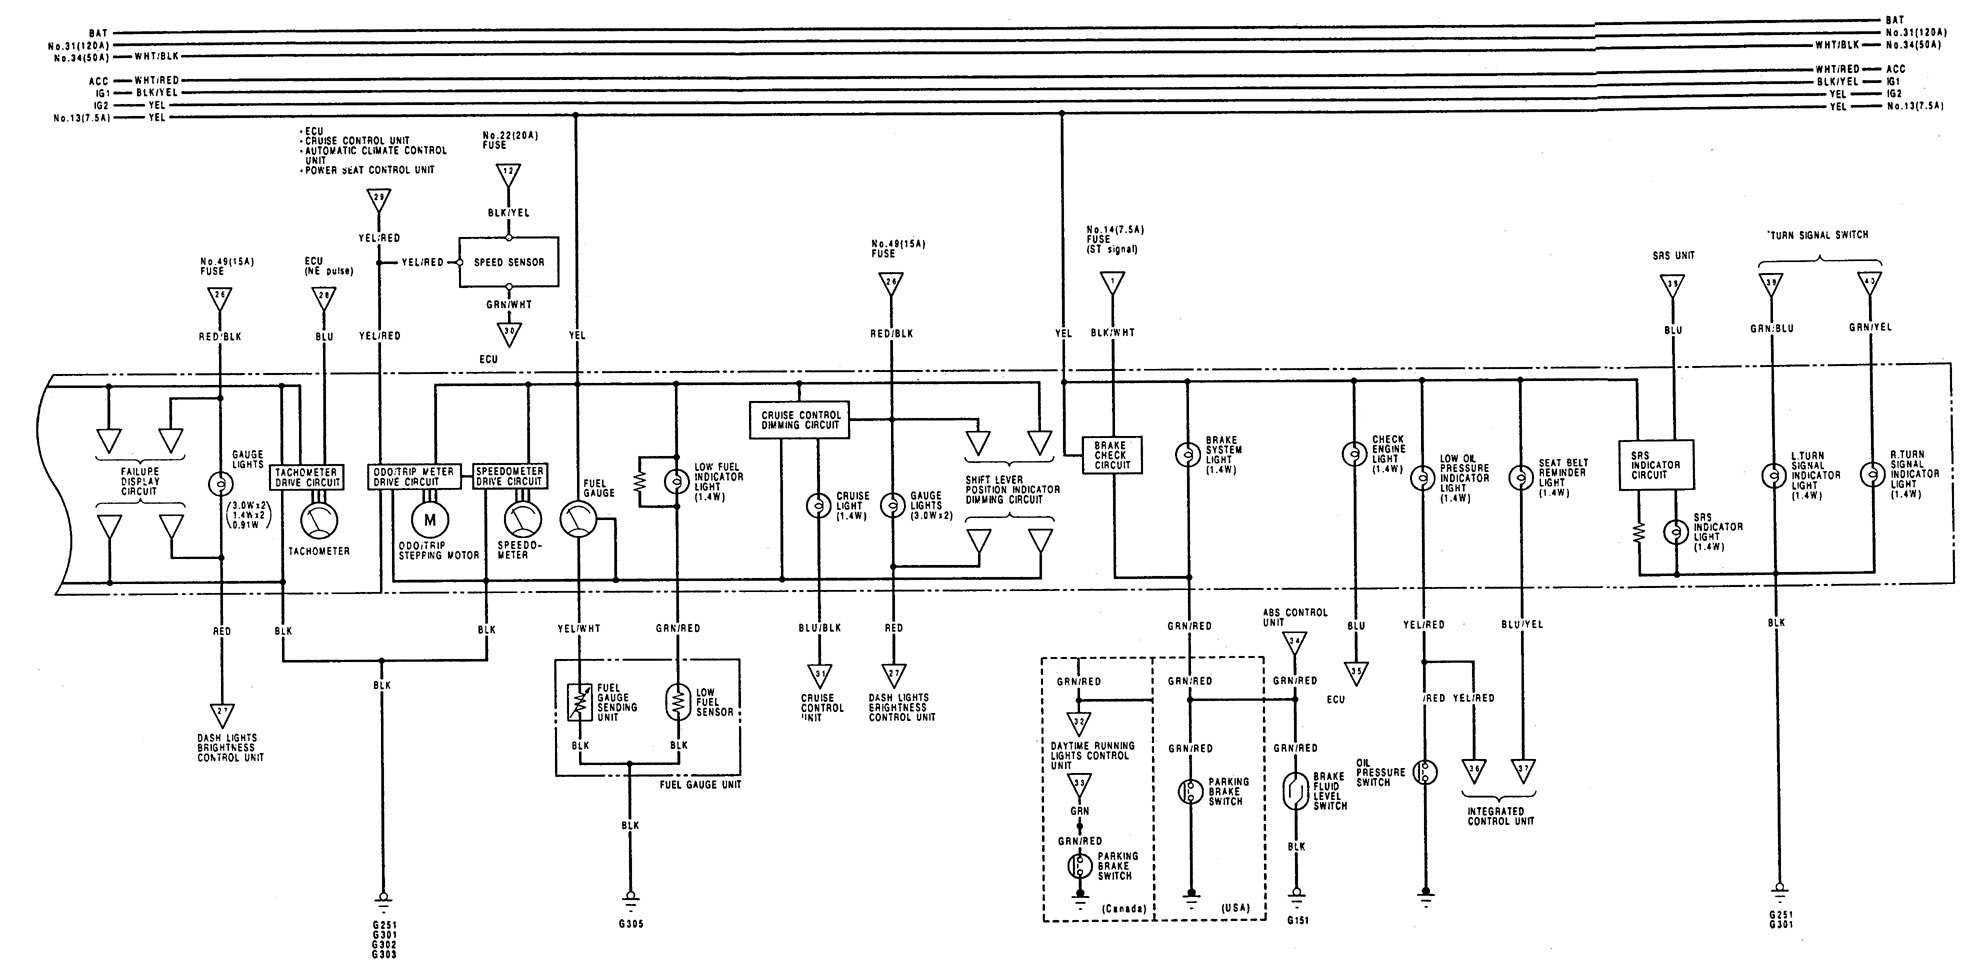 1987 bmw 325i fuse diagram honda ruckus ignition wiring convertible imageresizertool com